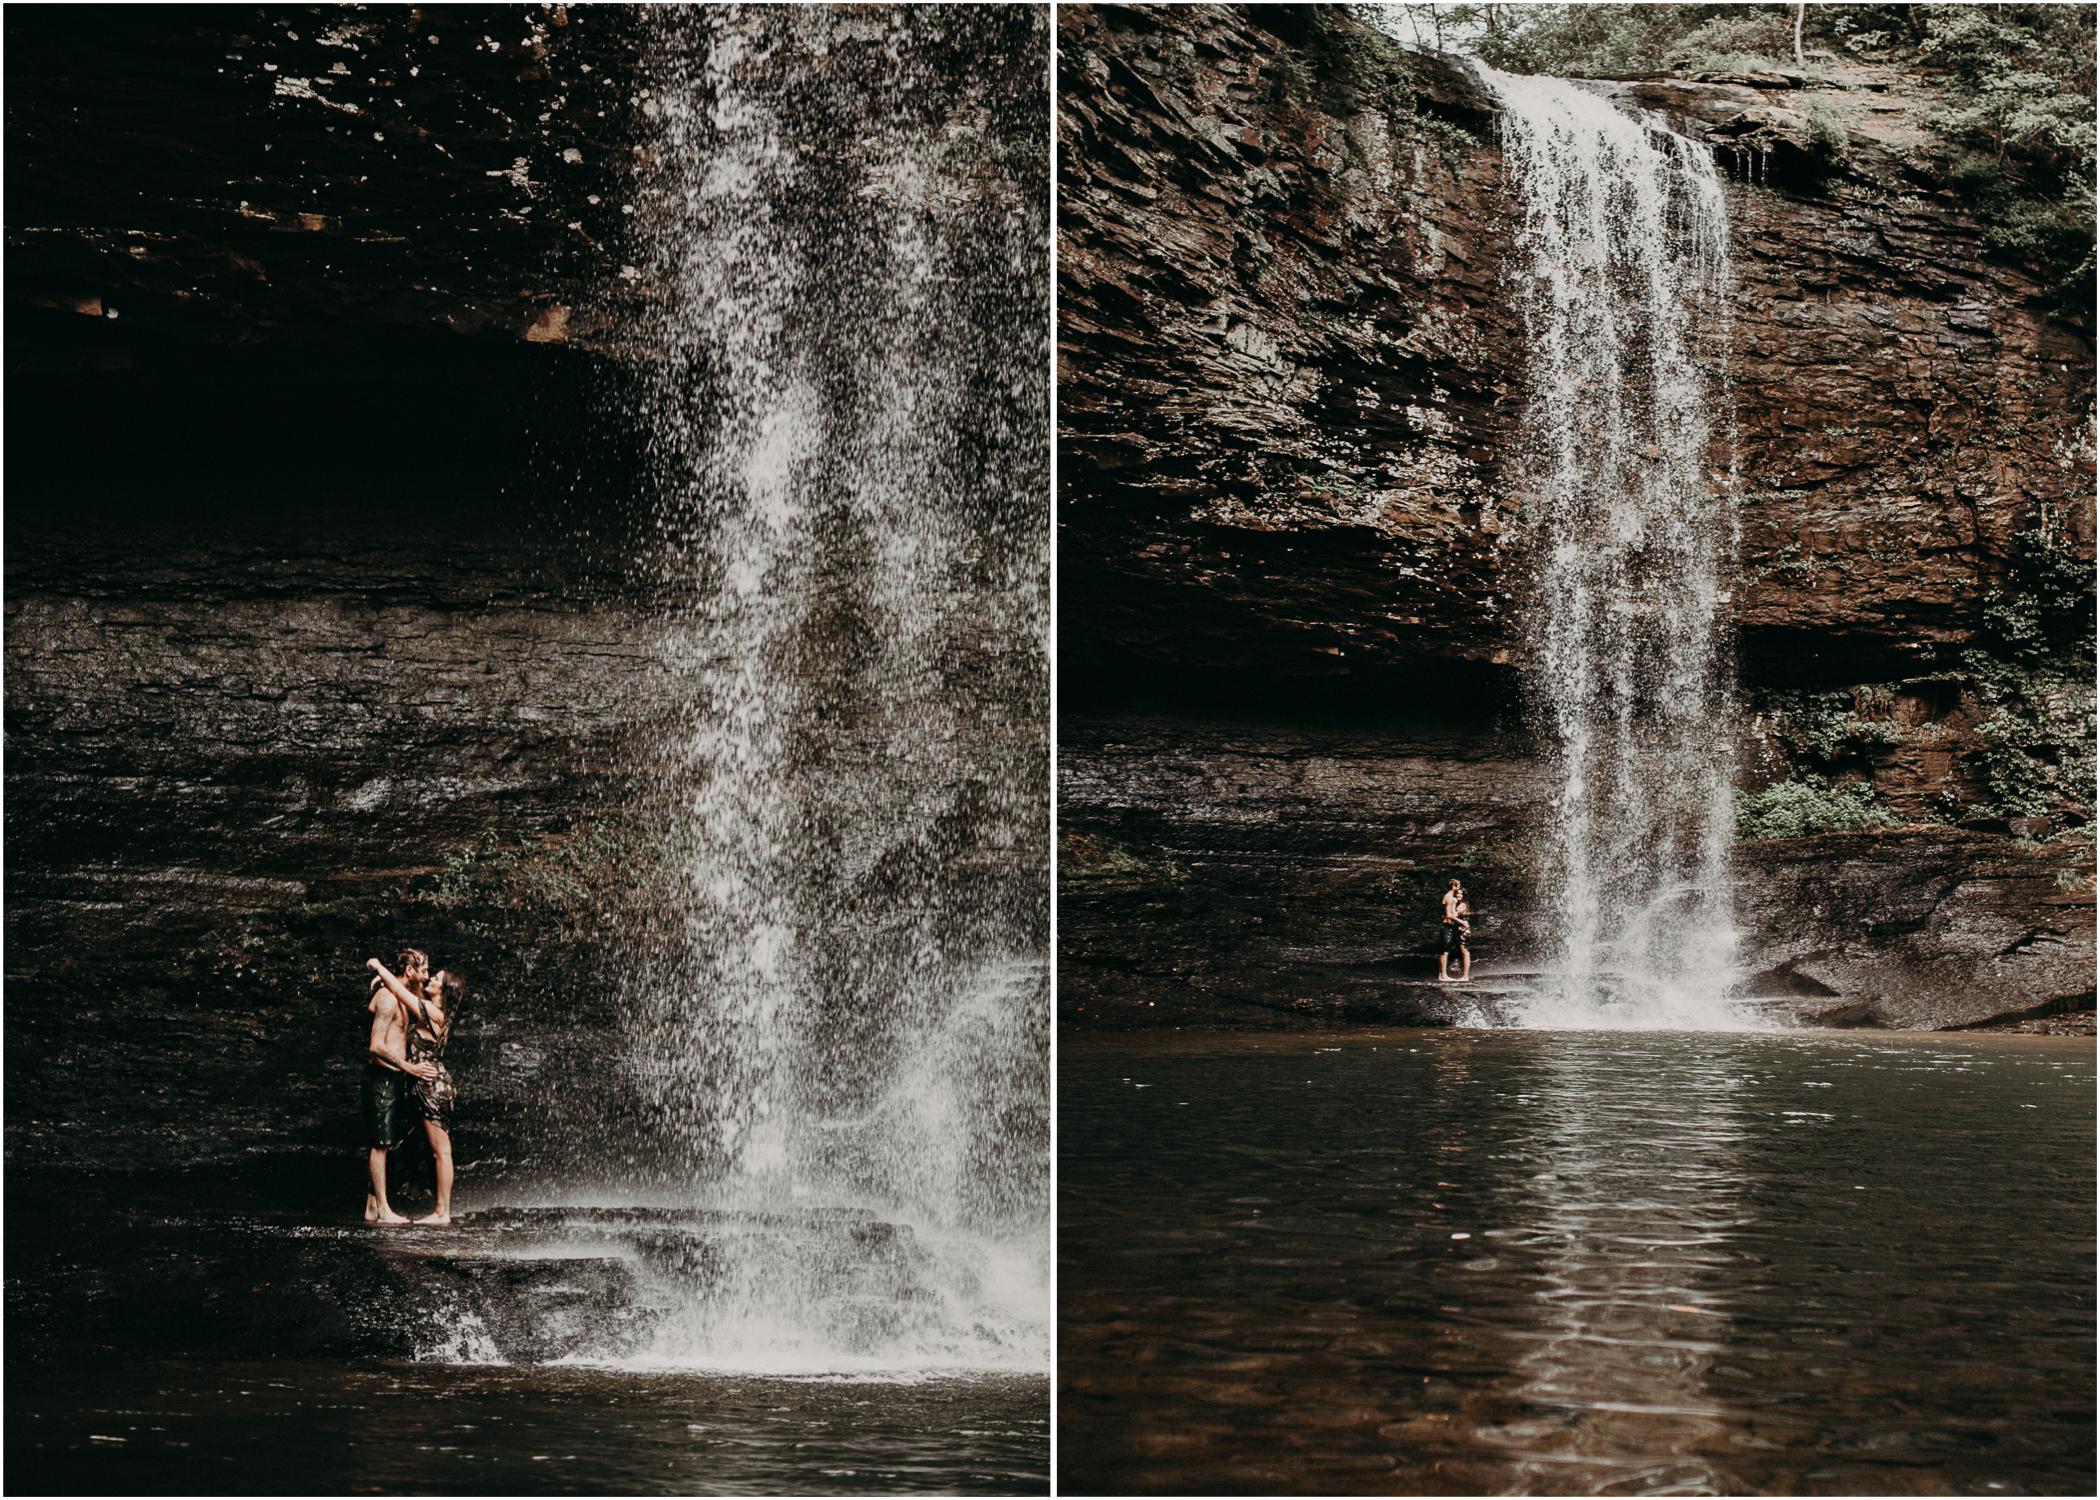 Cloudland canyon, whaterfall georgia, couples waterfall engagement 32.jpg